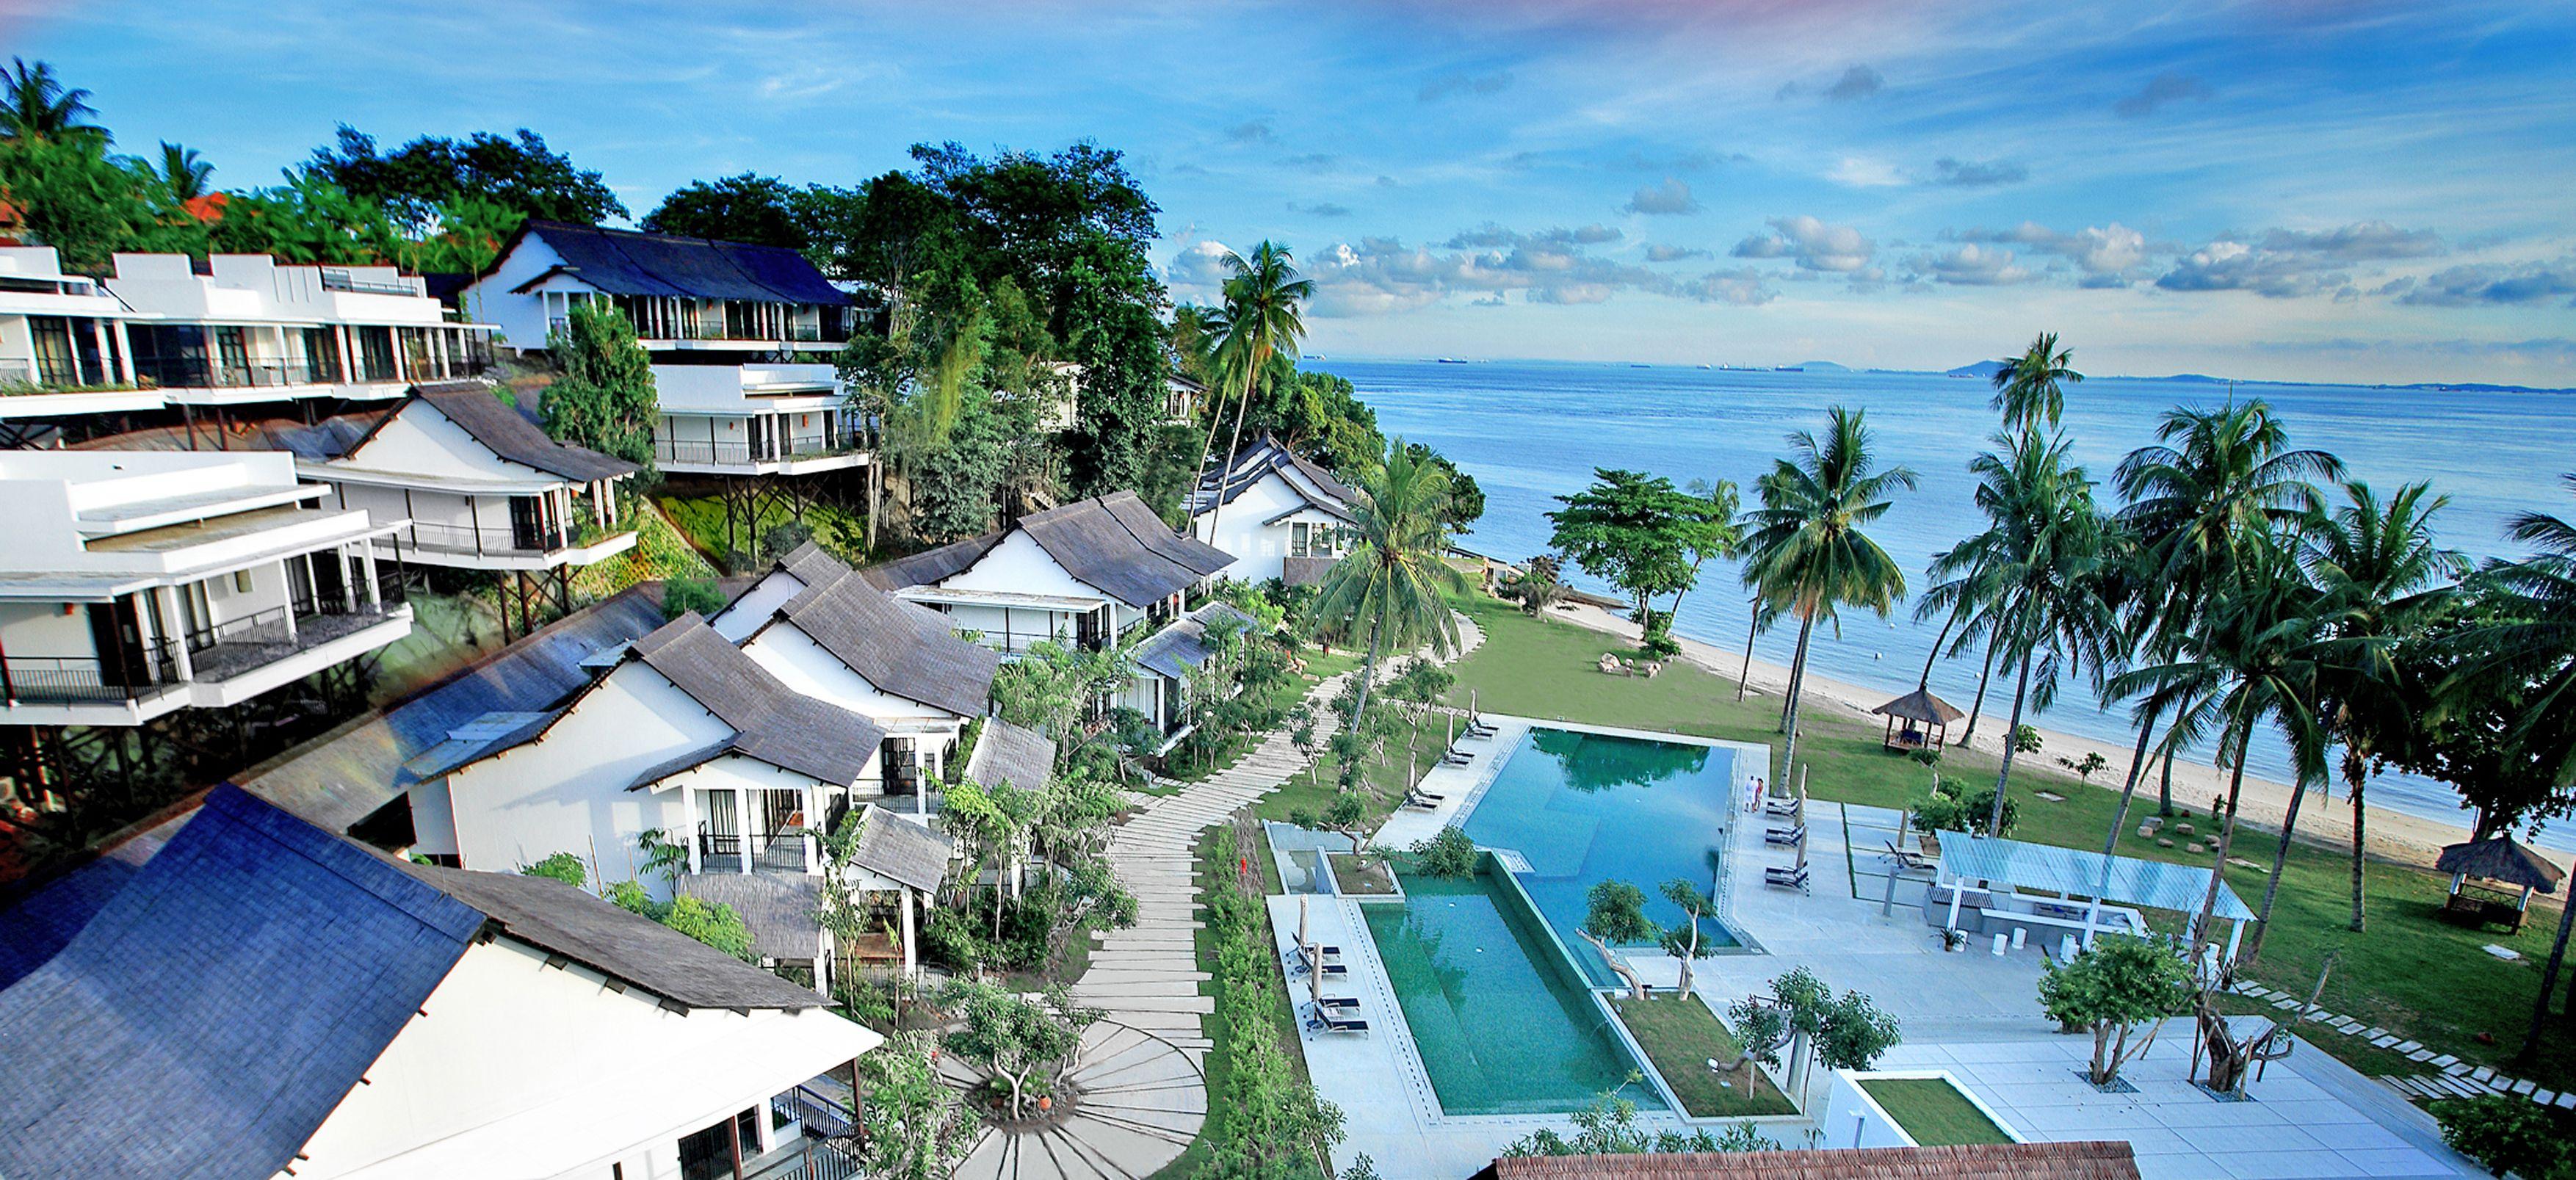 Turi Beach Resort With Images